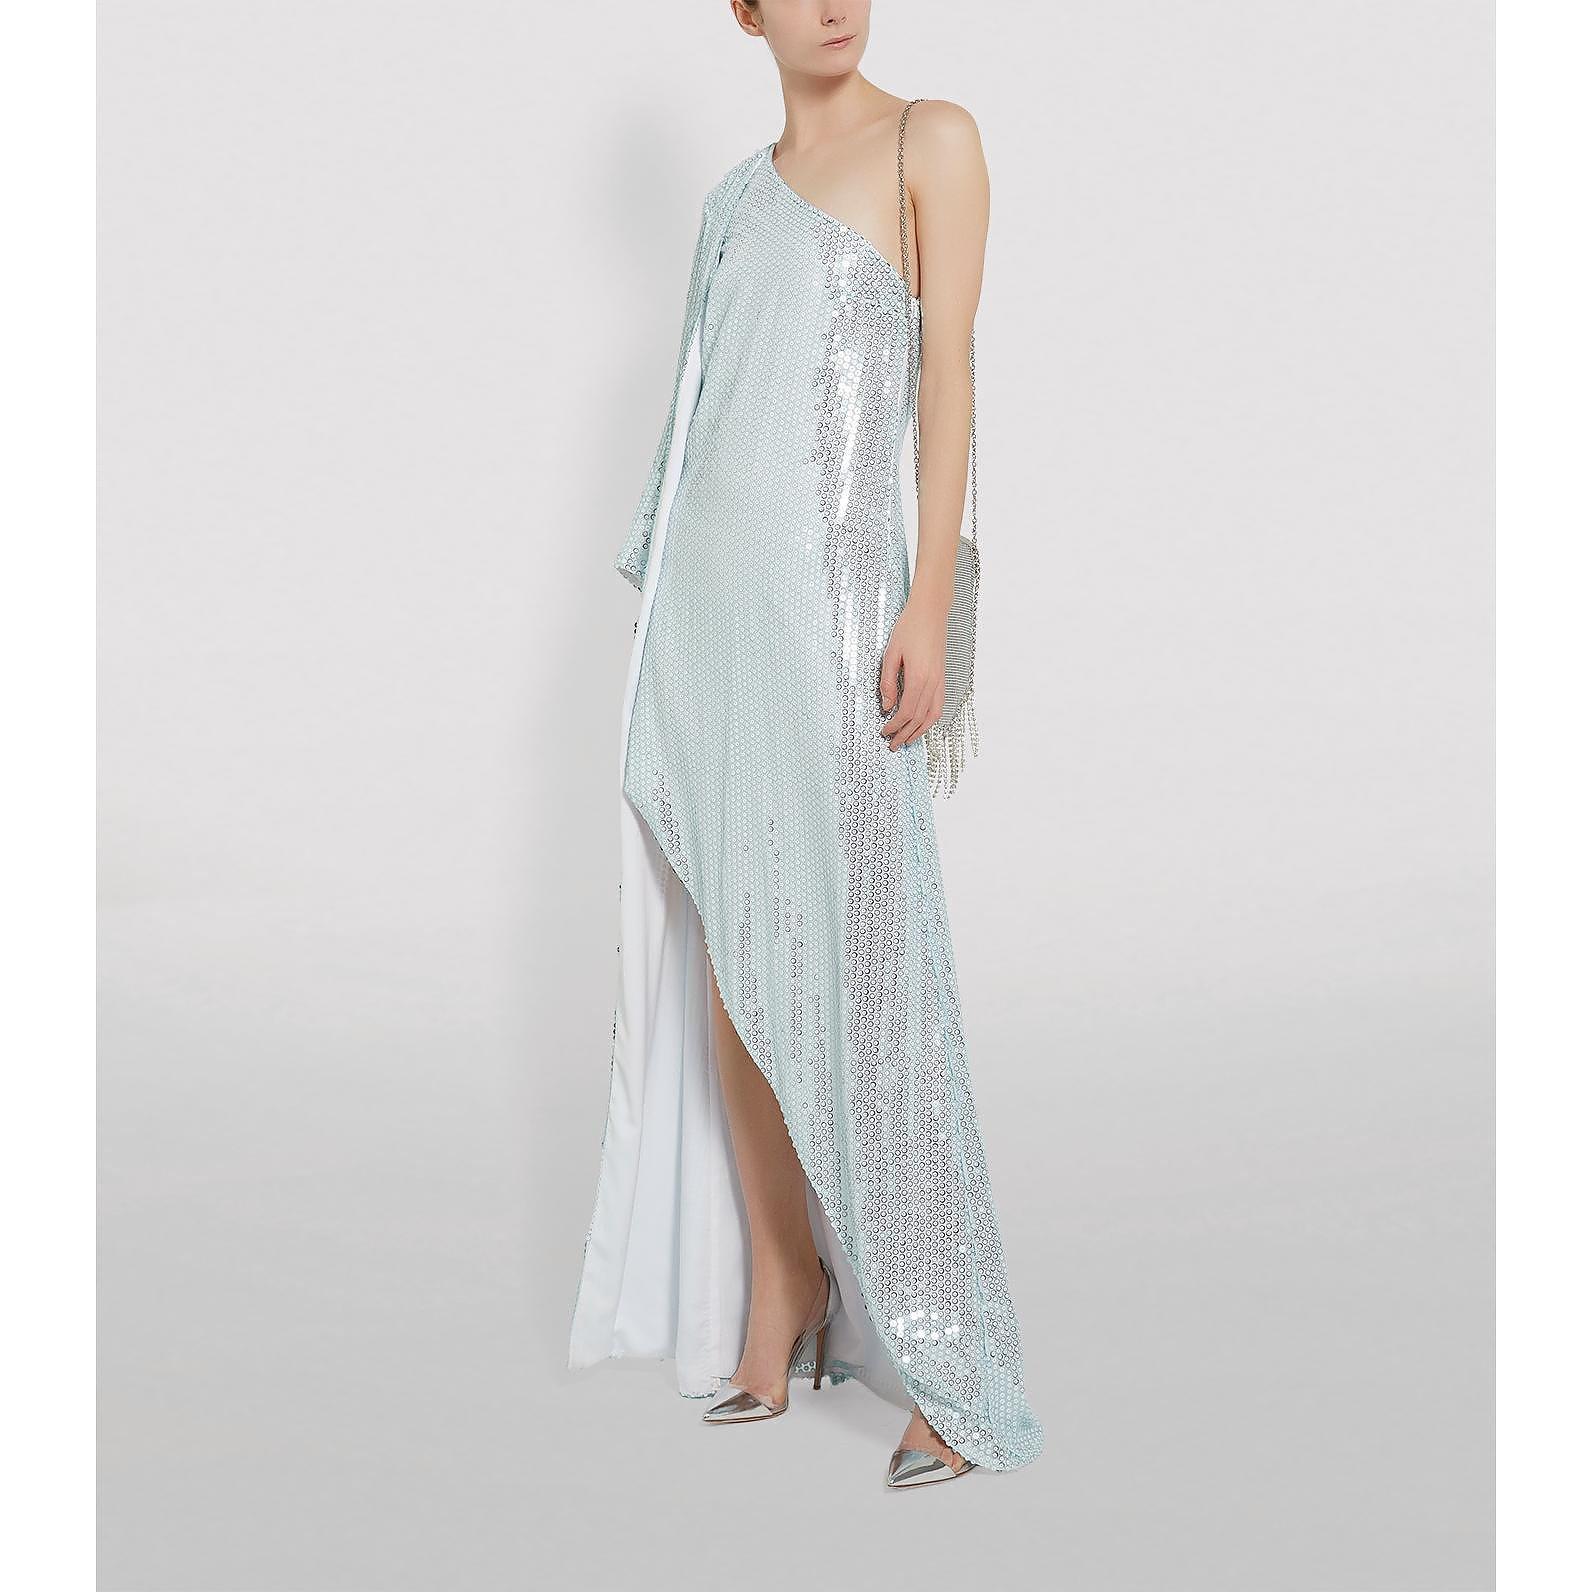 Halpern Asymmetric Sequin Dress